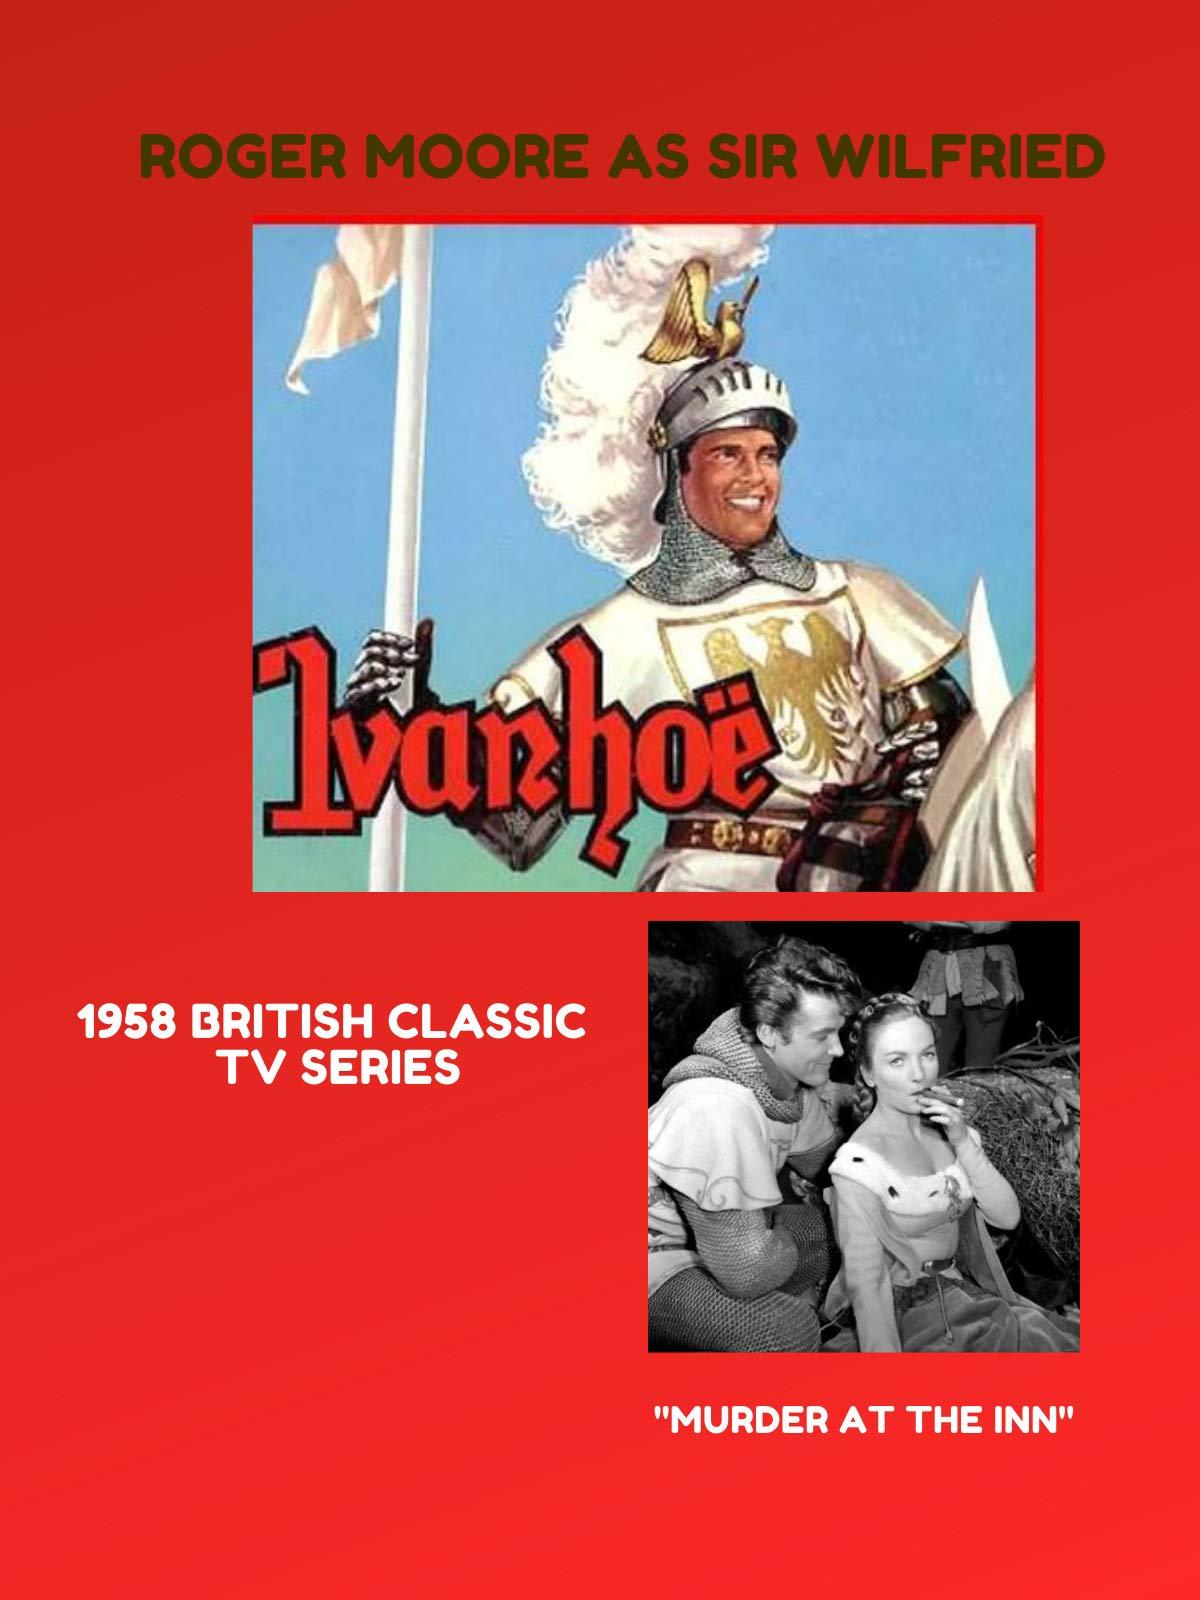 British 1958 TV Series Ivanhoe Murder at the Inn starring Roger Moore